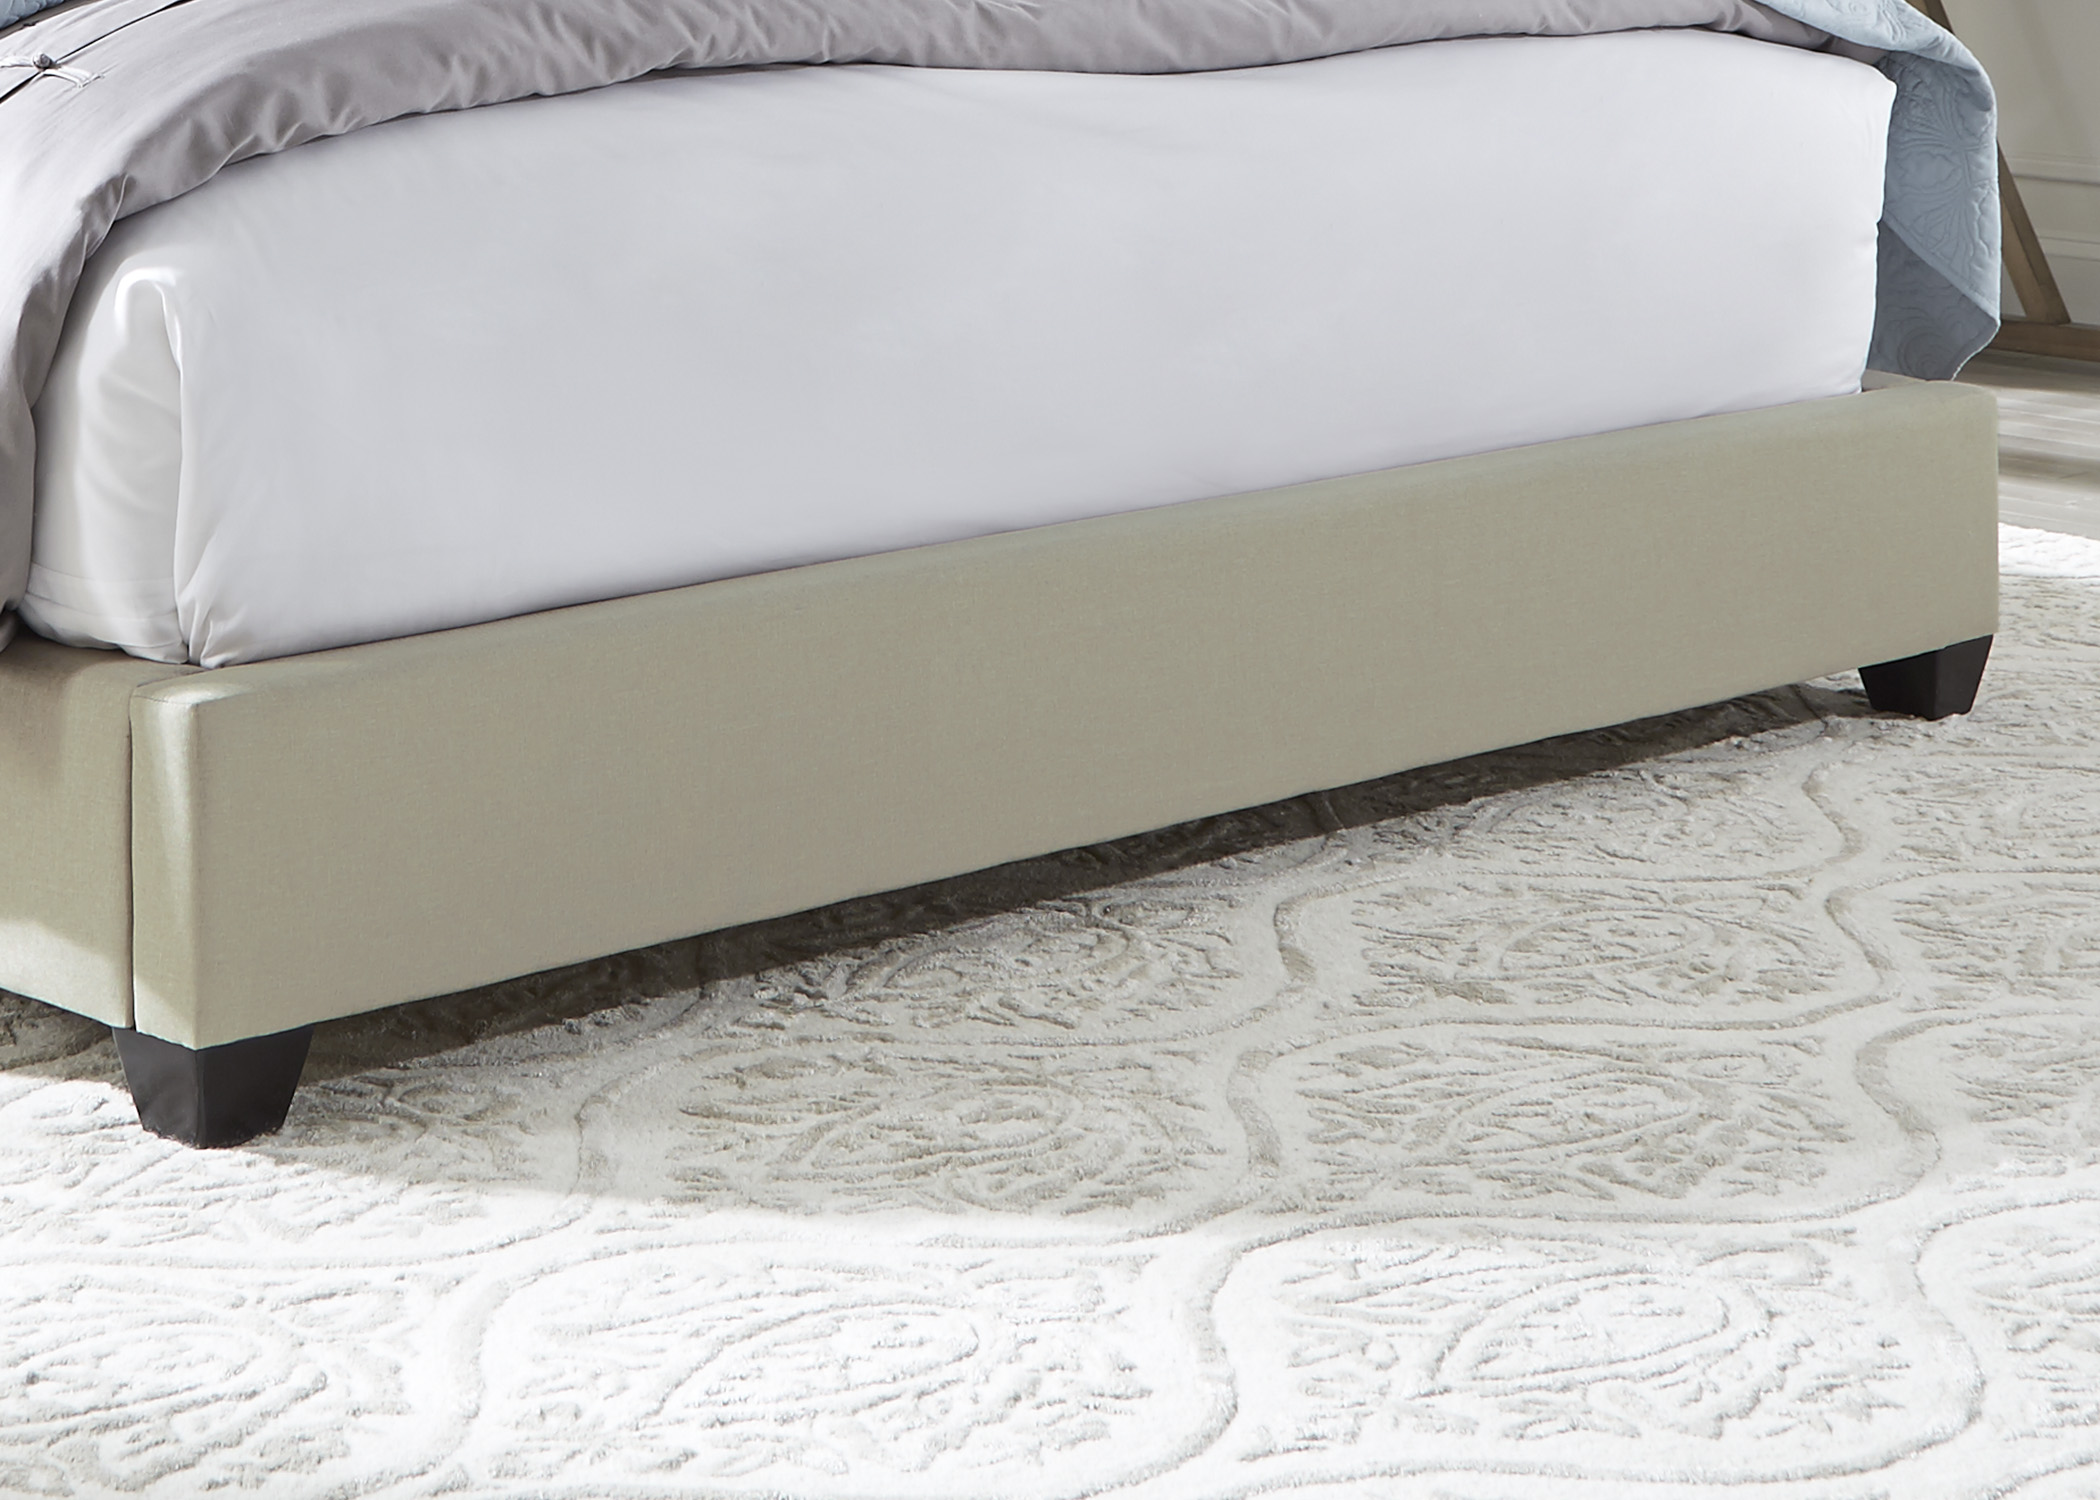 Liberty Furniture King Footboard, Rails & Slats